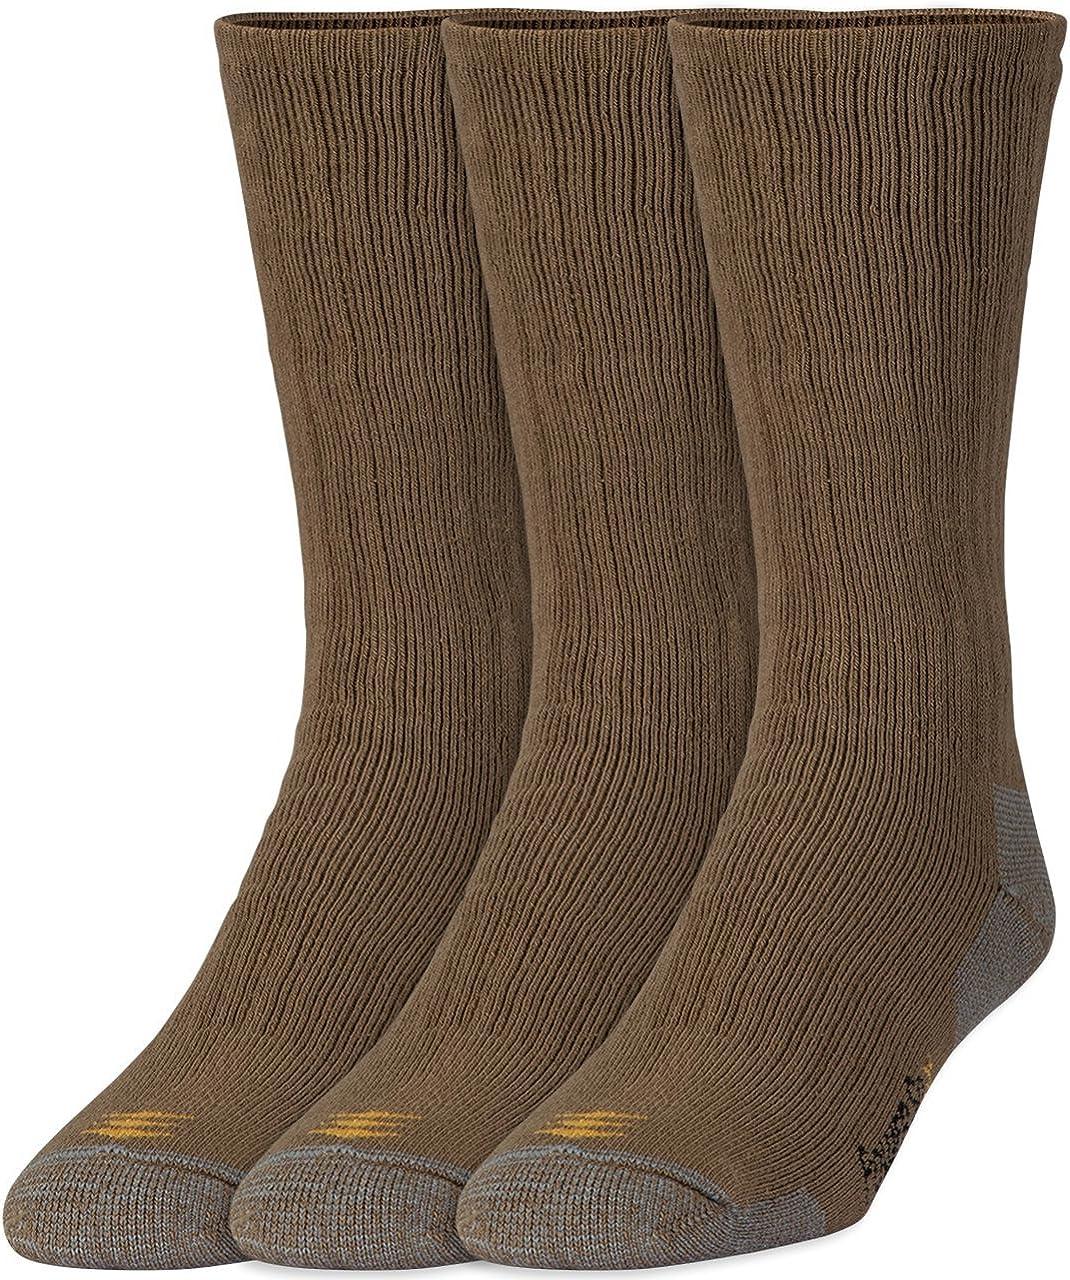 PowerSox mens Bootsocks Medium Cushion Cotton Crew Socks, 3 Pairs